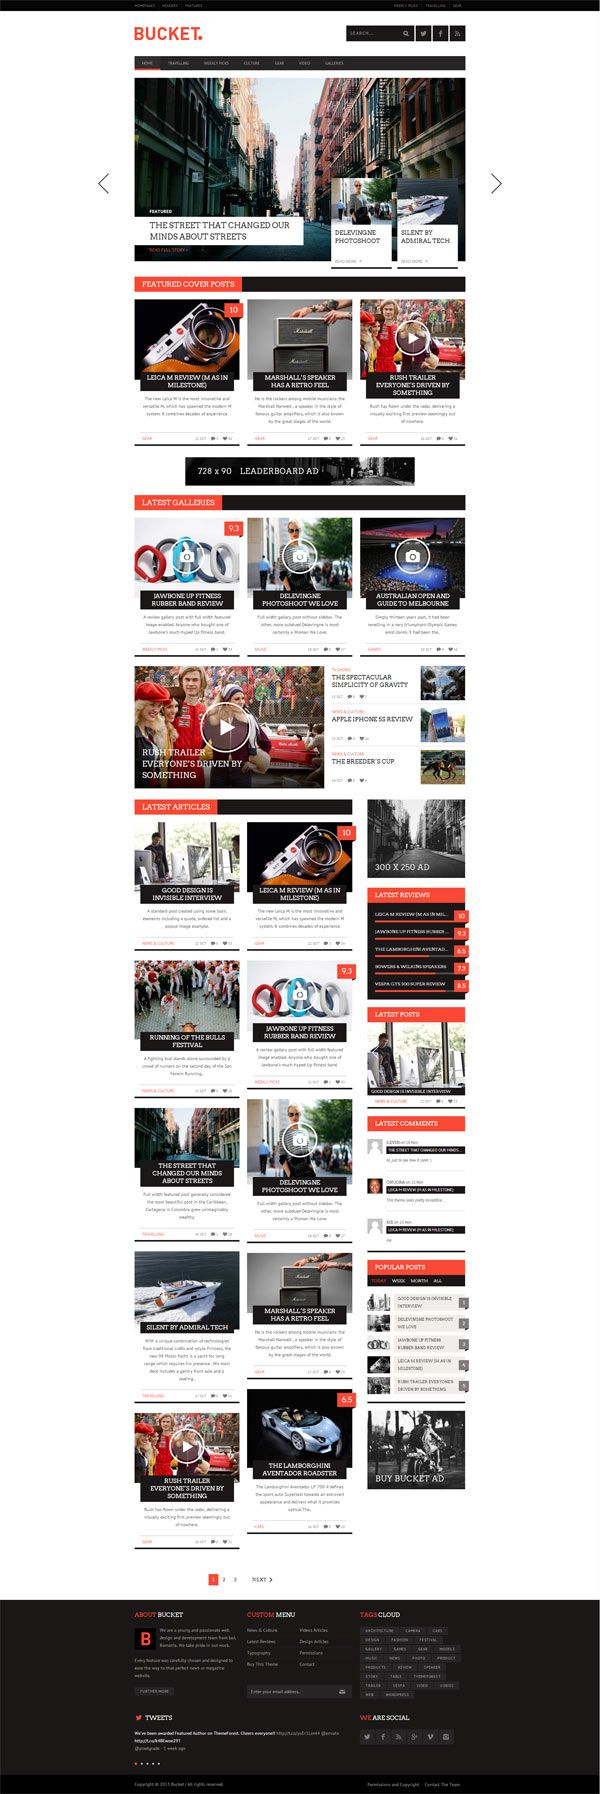 BUCKET - Magazine Style WordPress Blog Theme